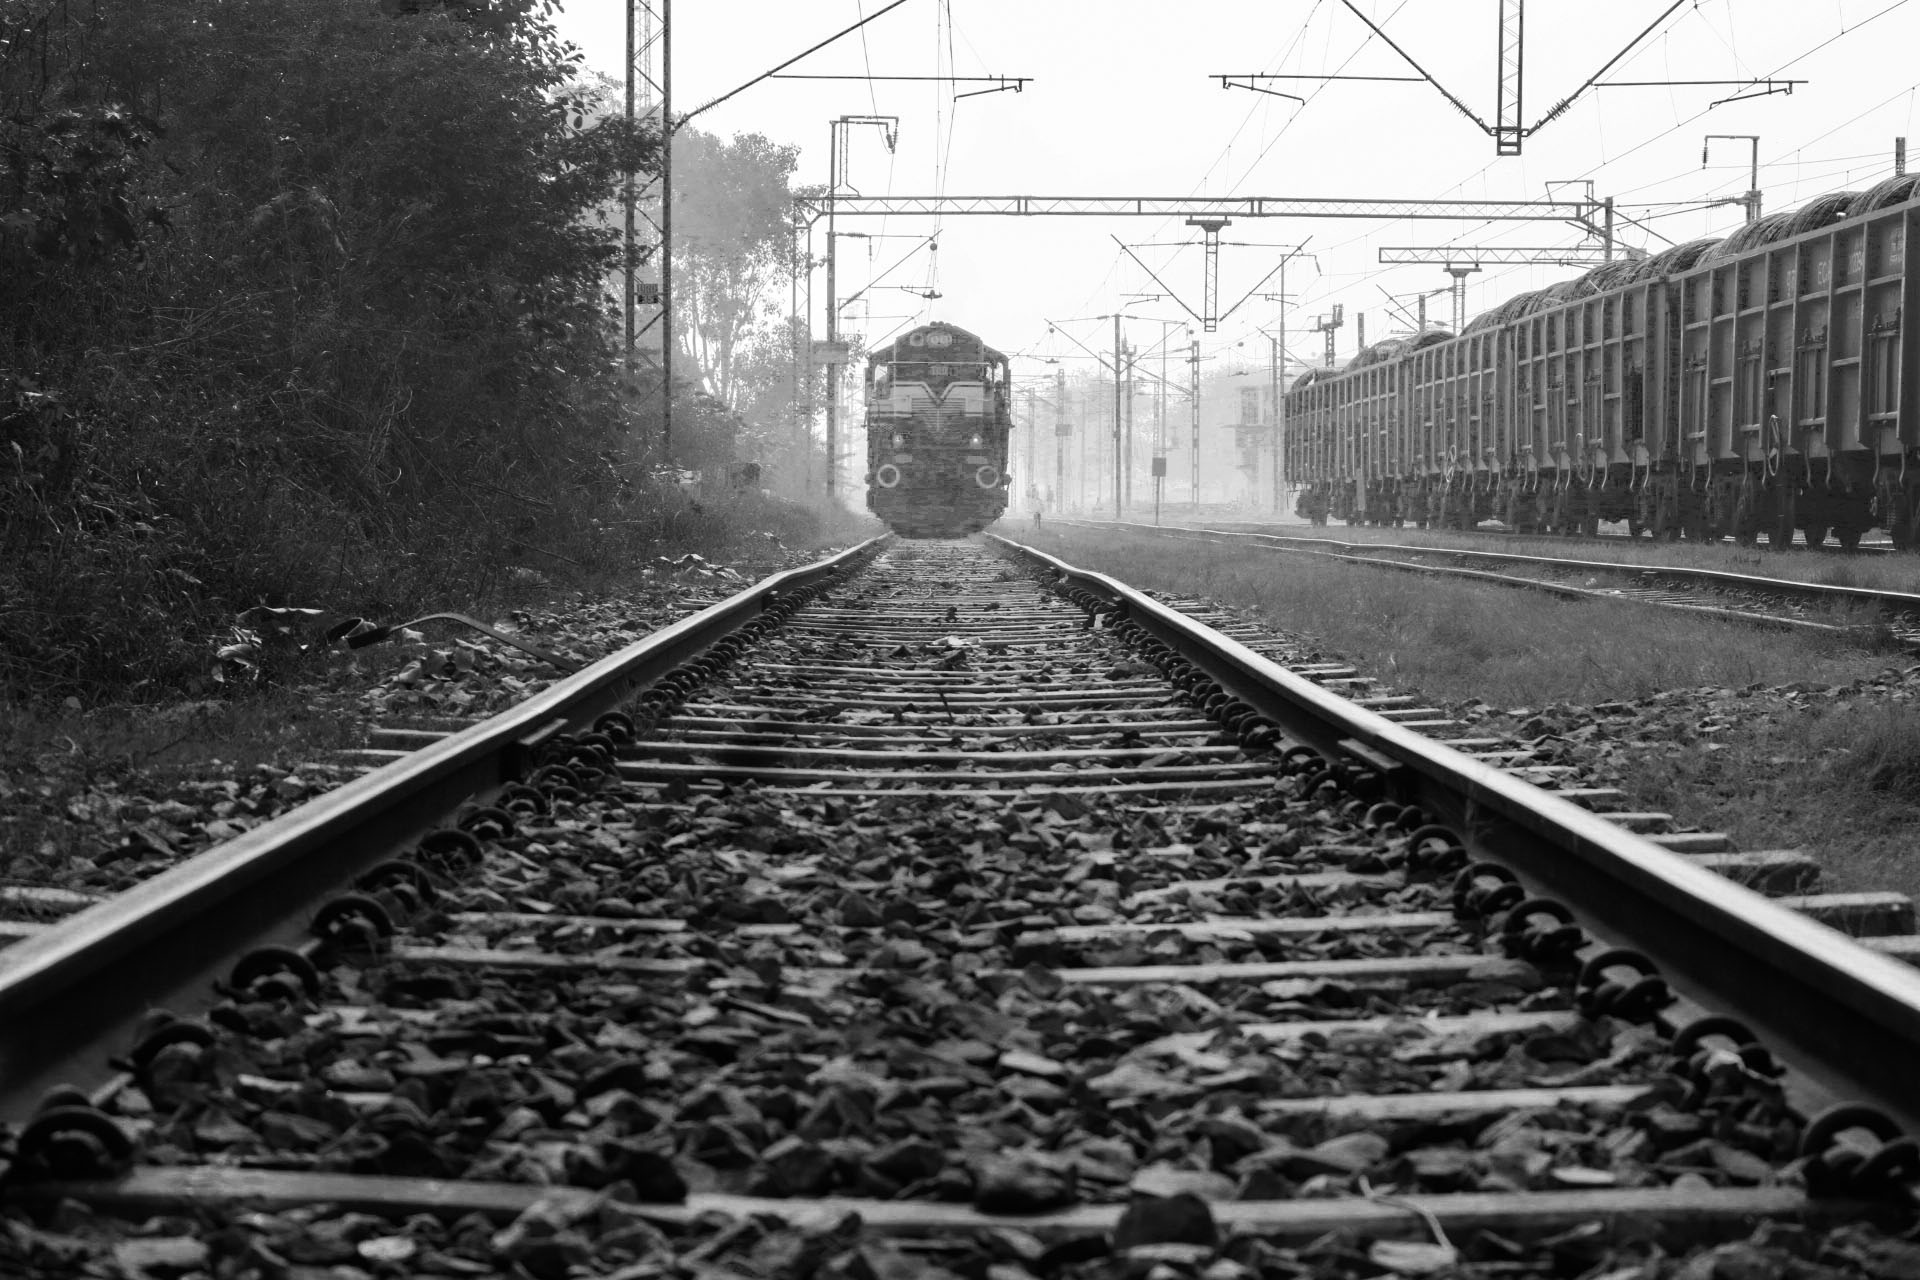 train coming near the train free stock photo